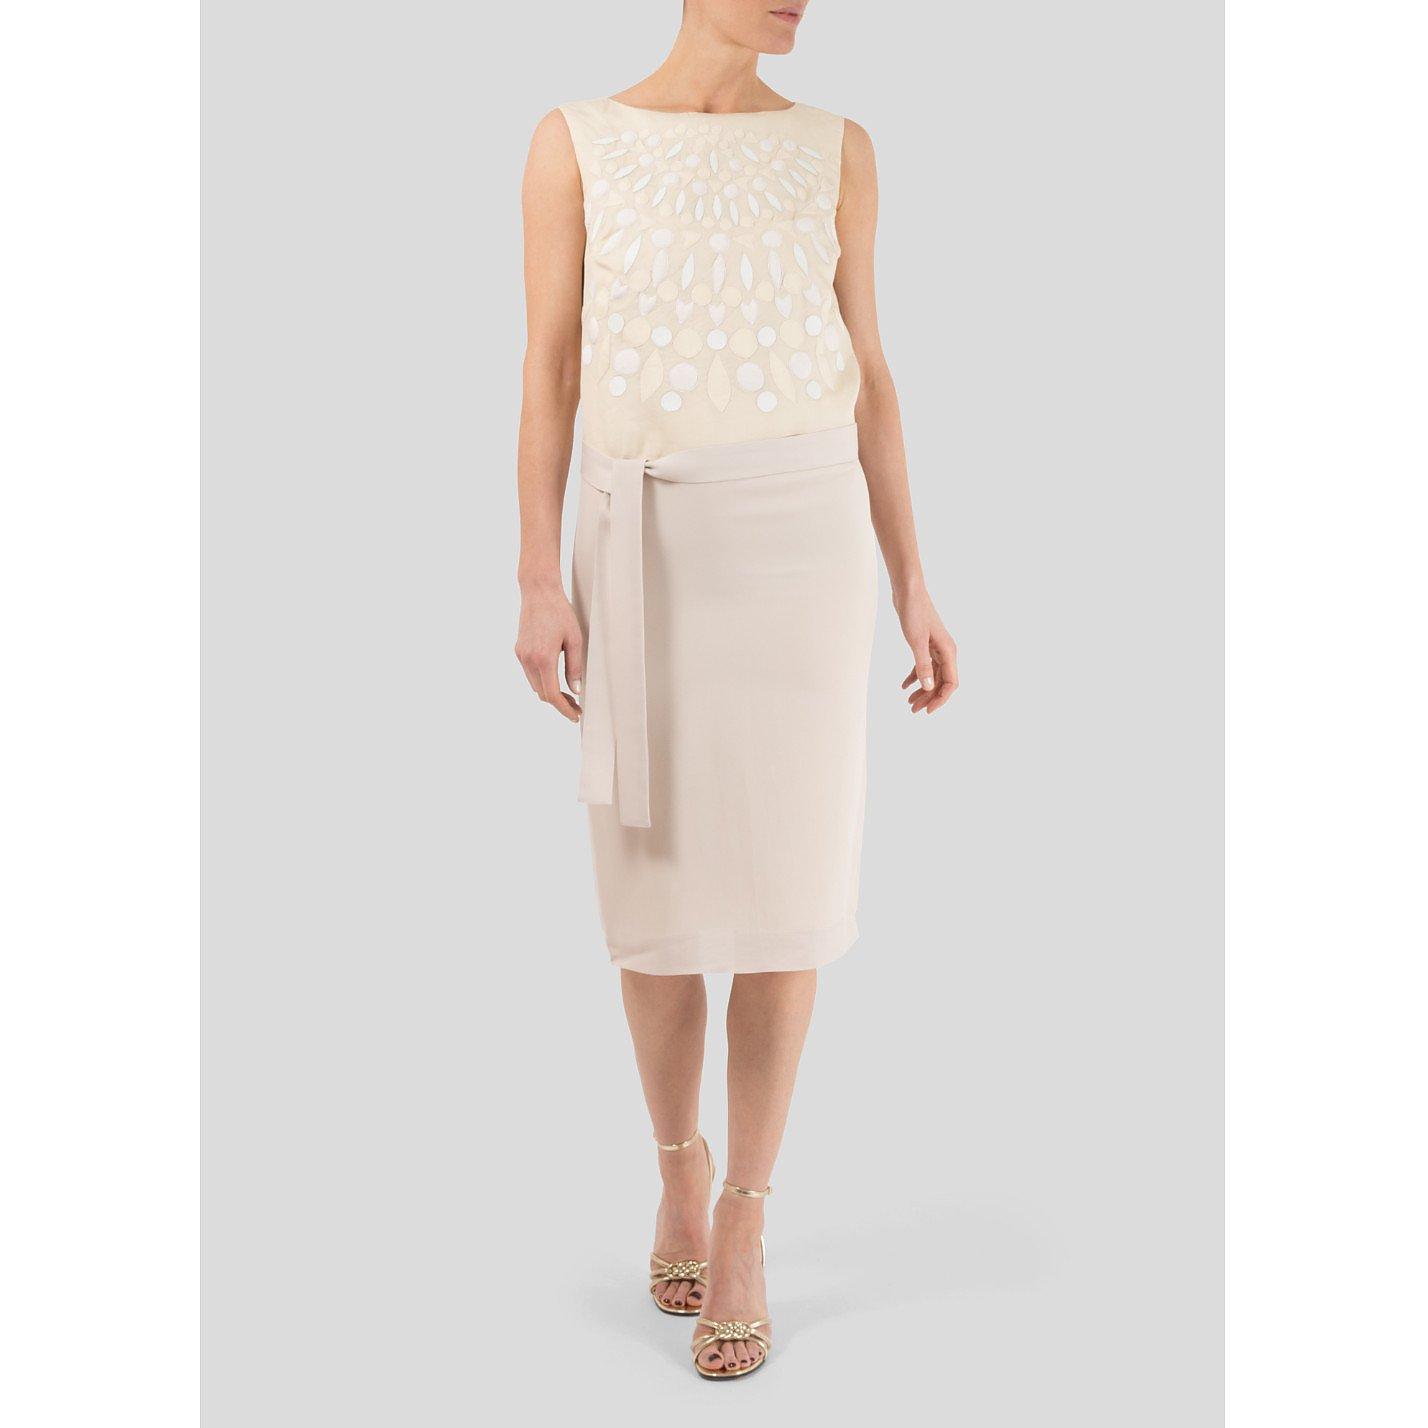 Victoria Beckham Petal Applique Sleeveless Dress